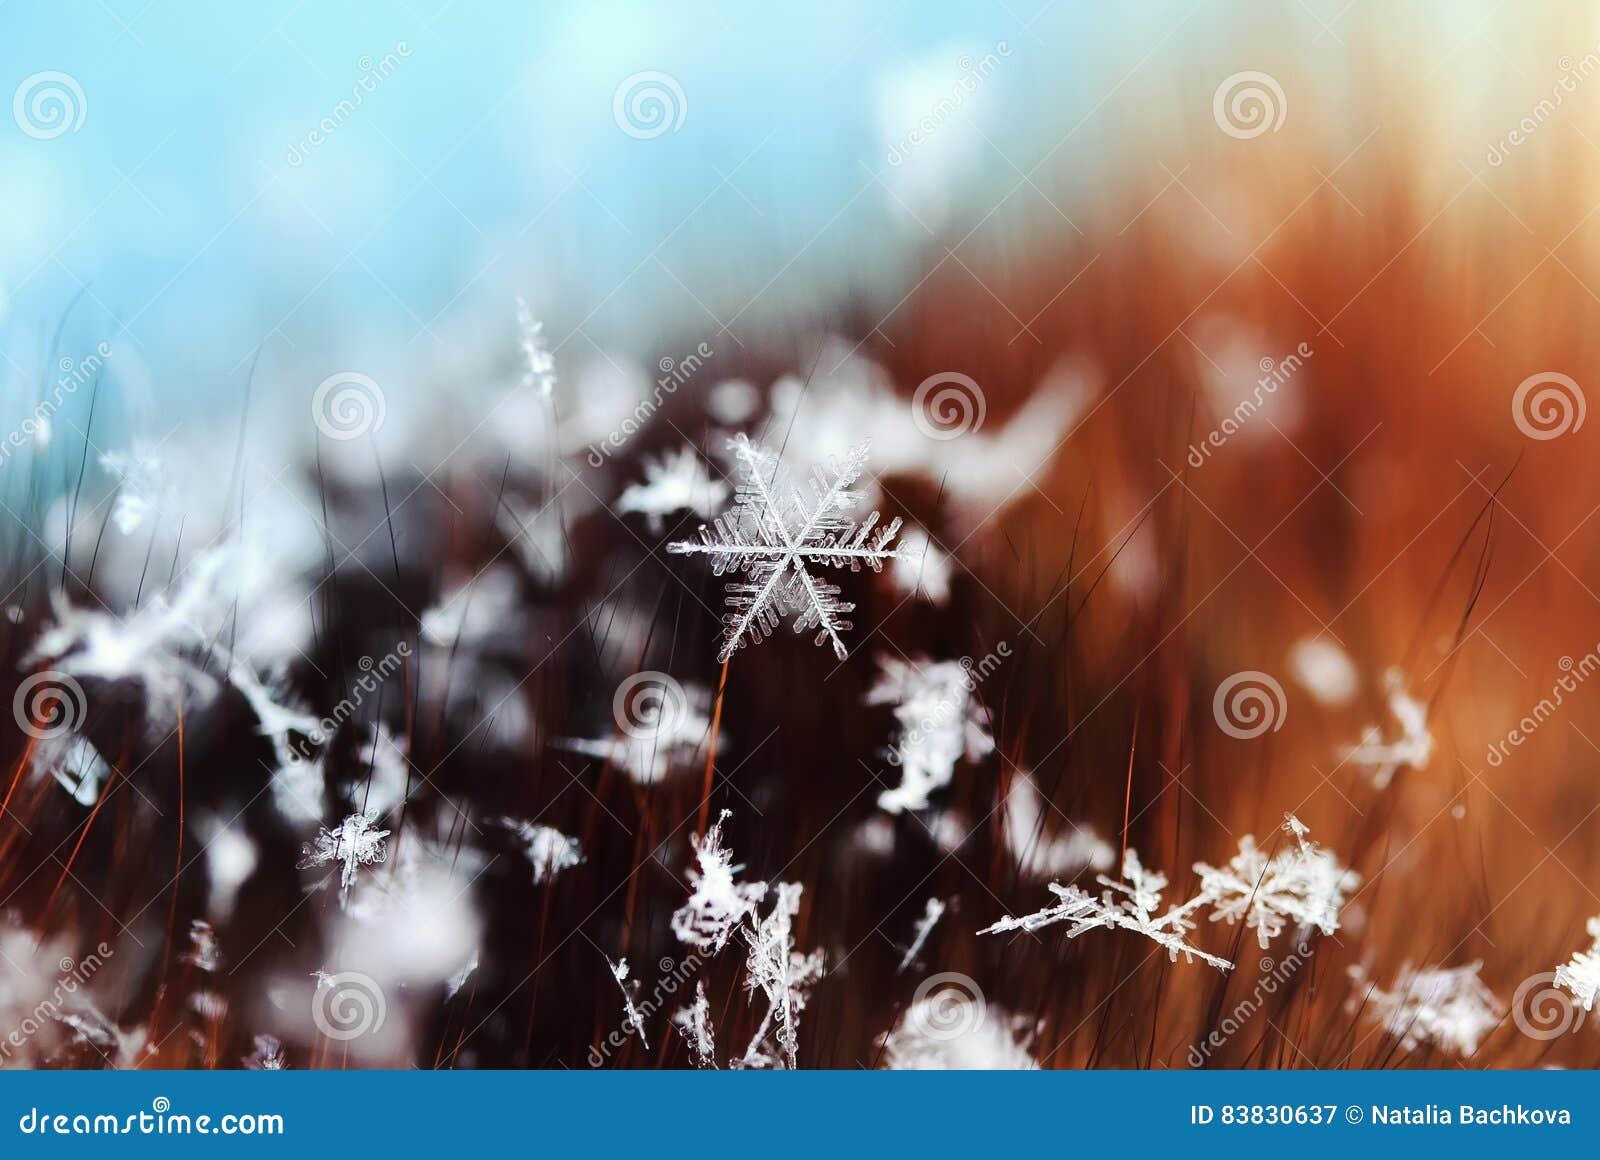 Beautiful snowflake lying on the fur hairs